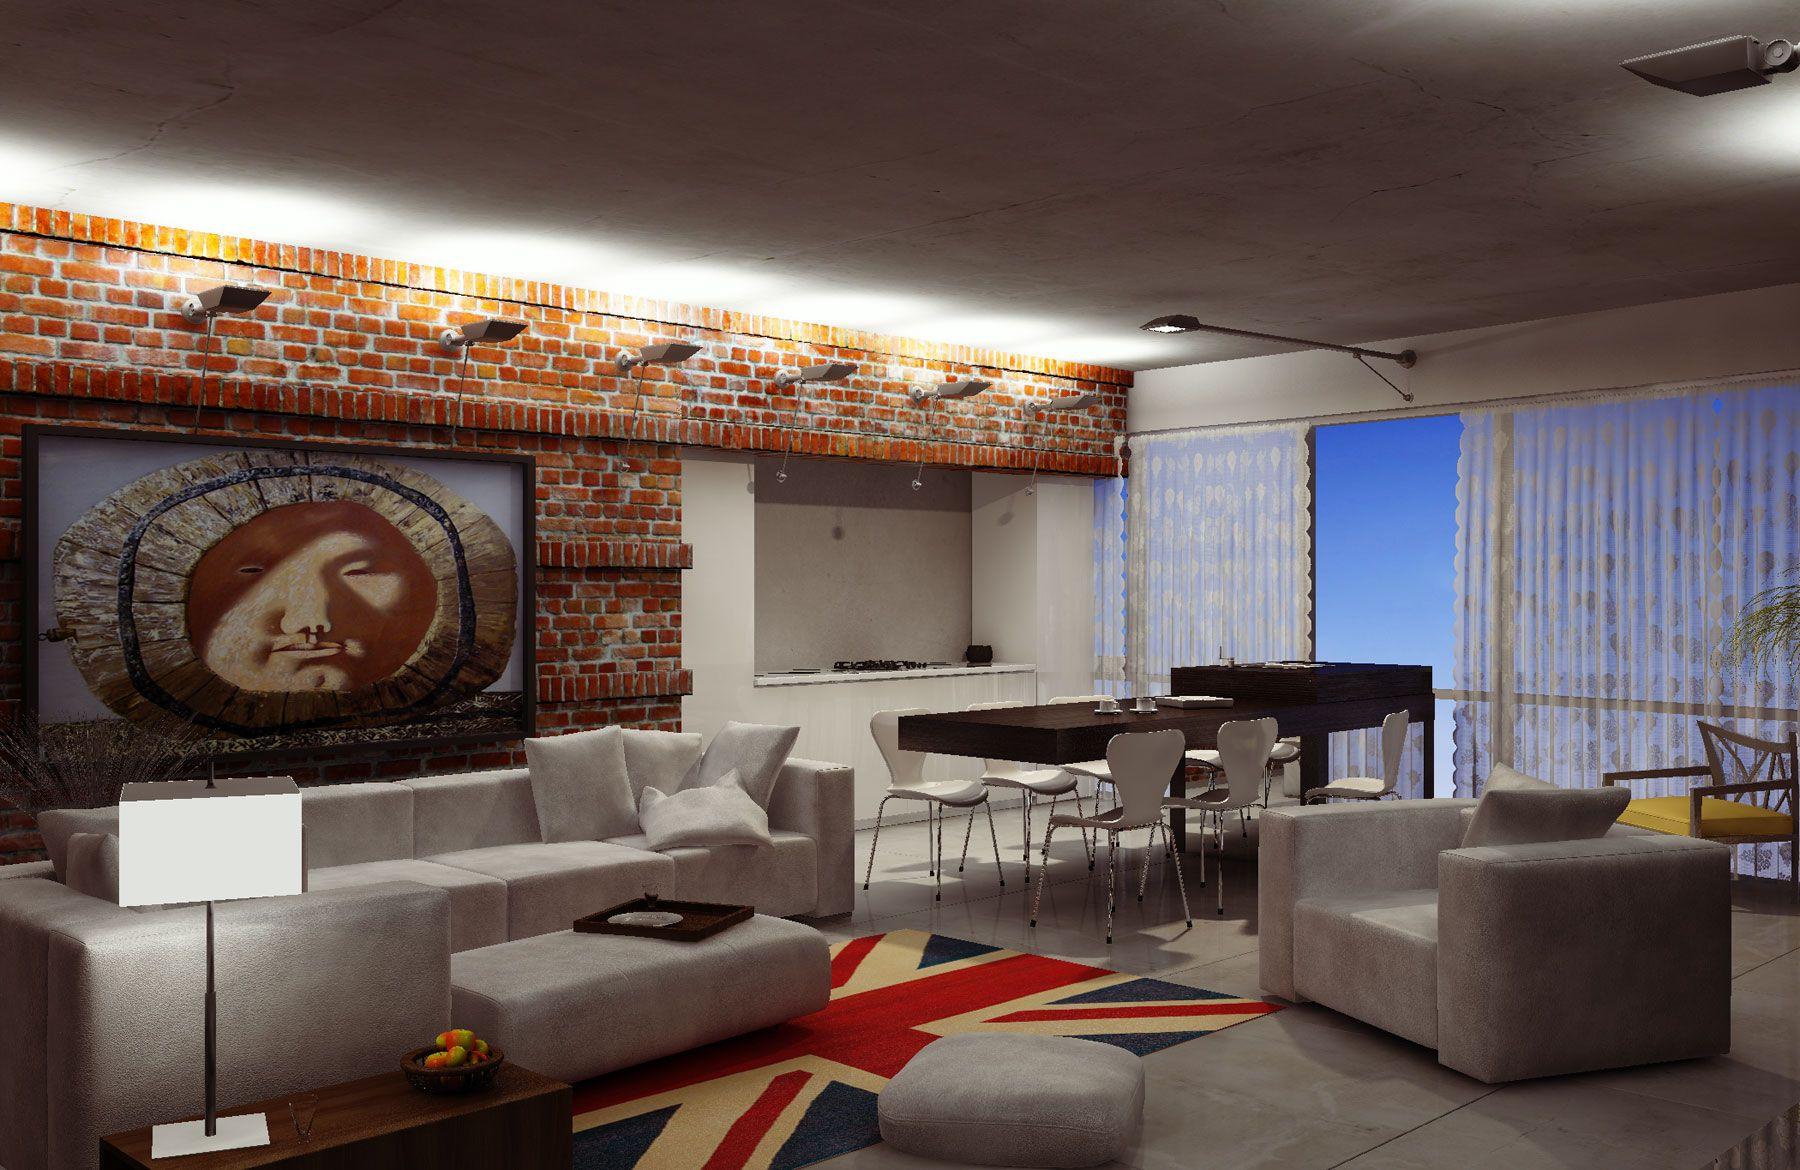 Stylish Laconic And Functional New York Loft Style: Loft Interior Design Style